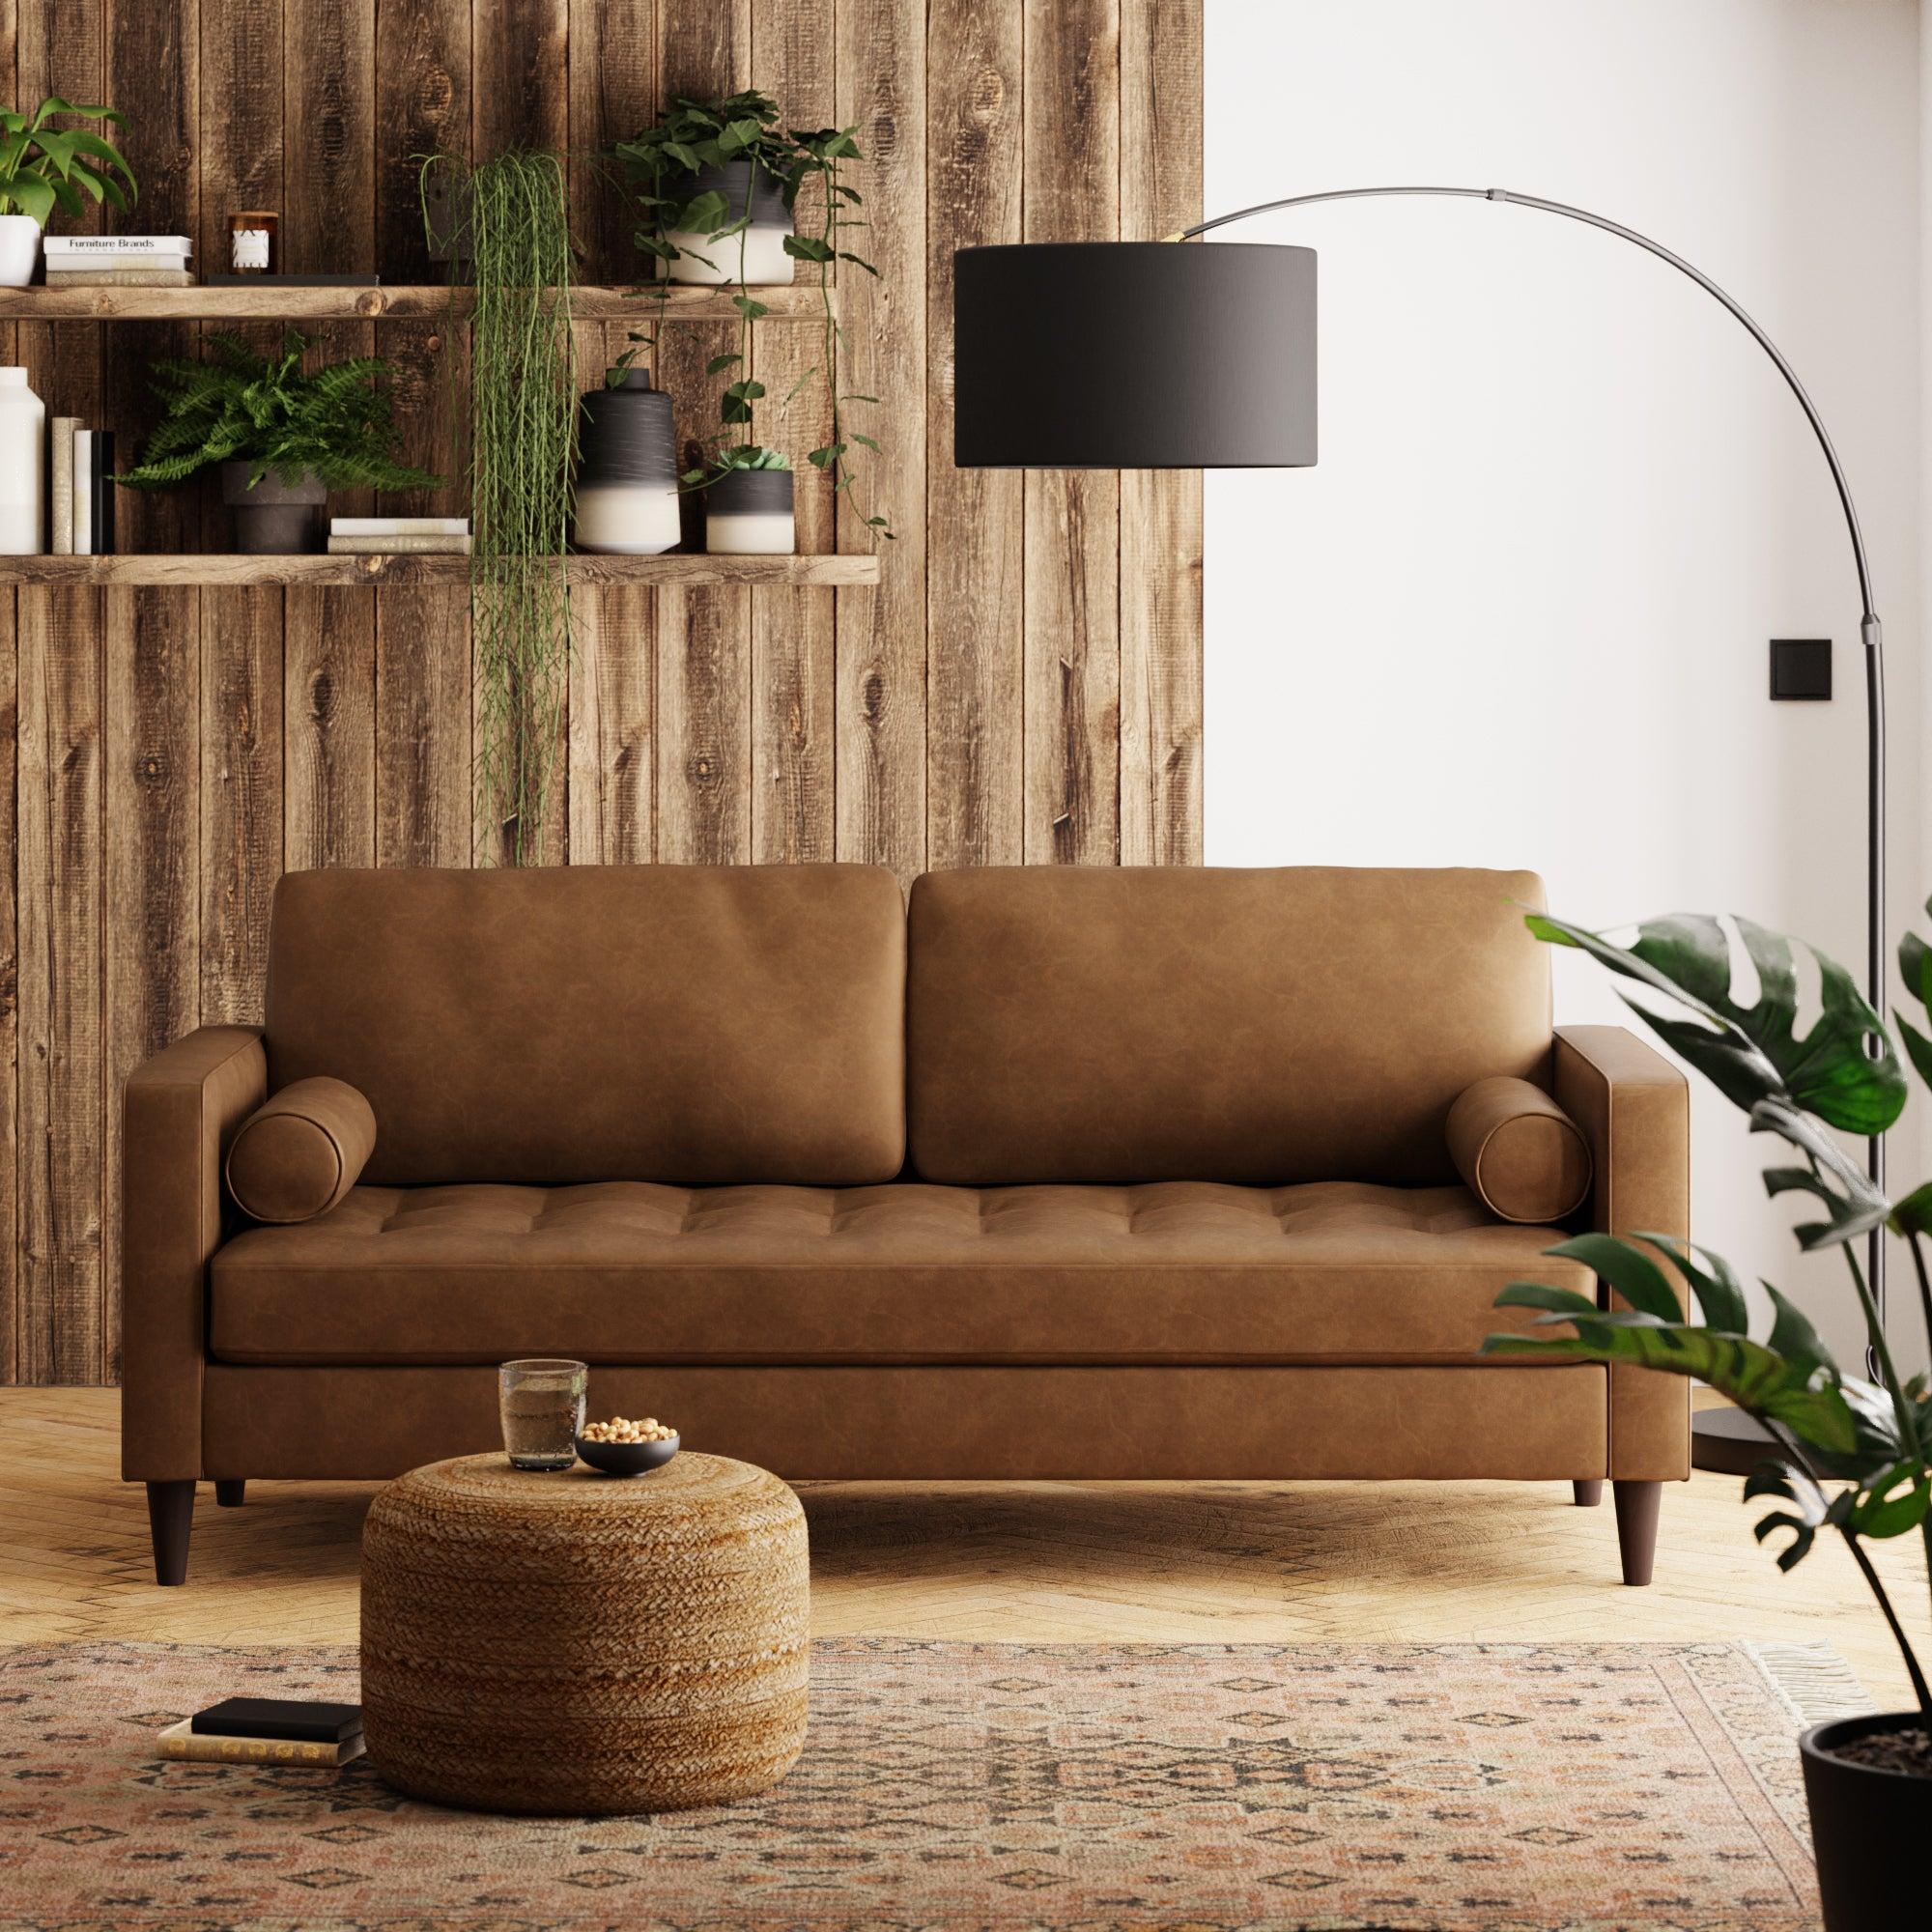 Zoe Faux Leather 3 Seater Sofa Tan (Brown)